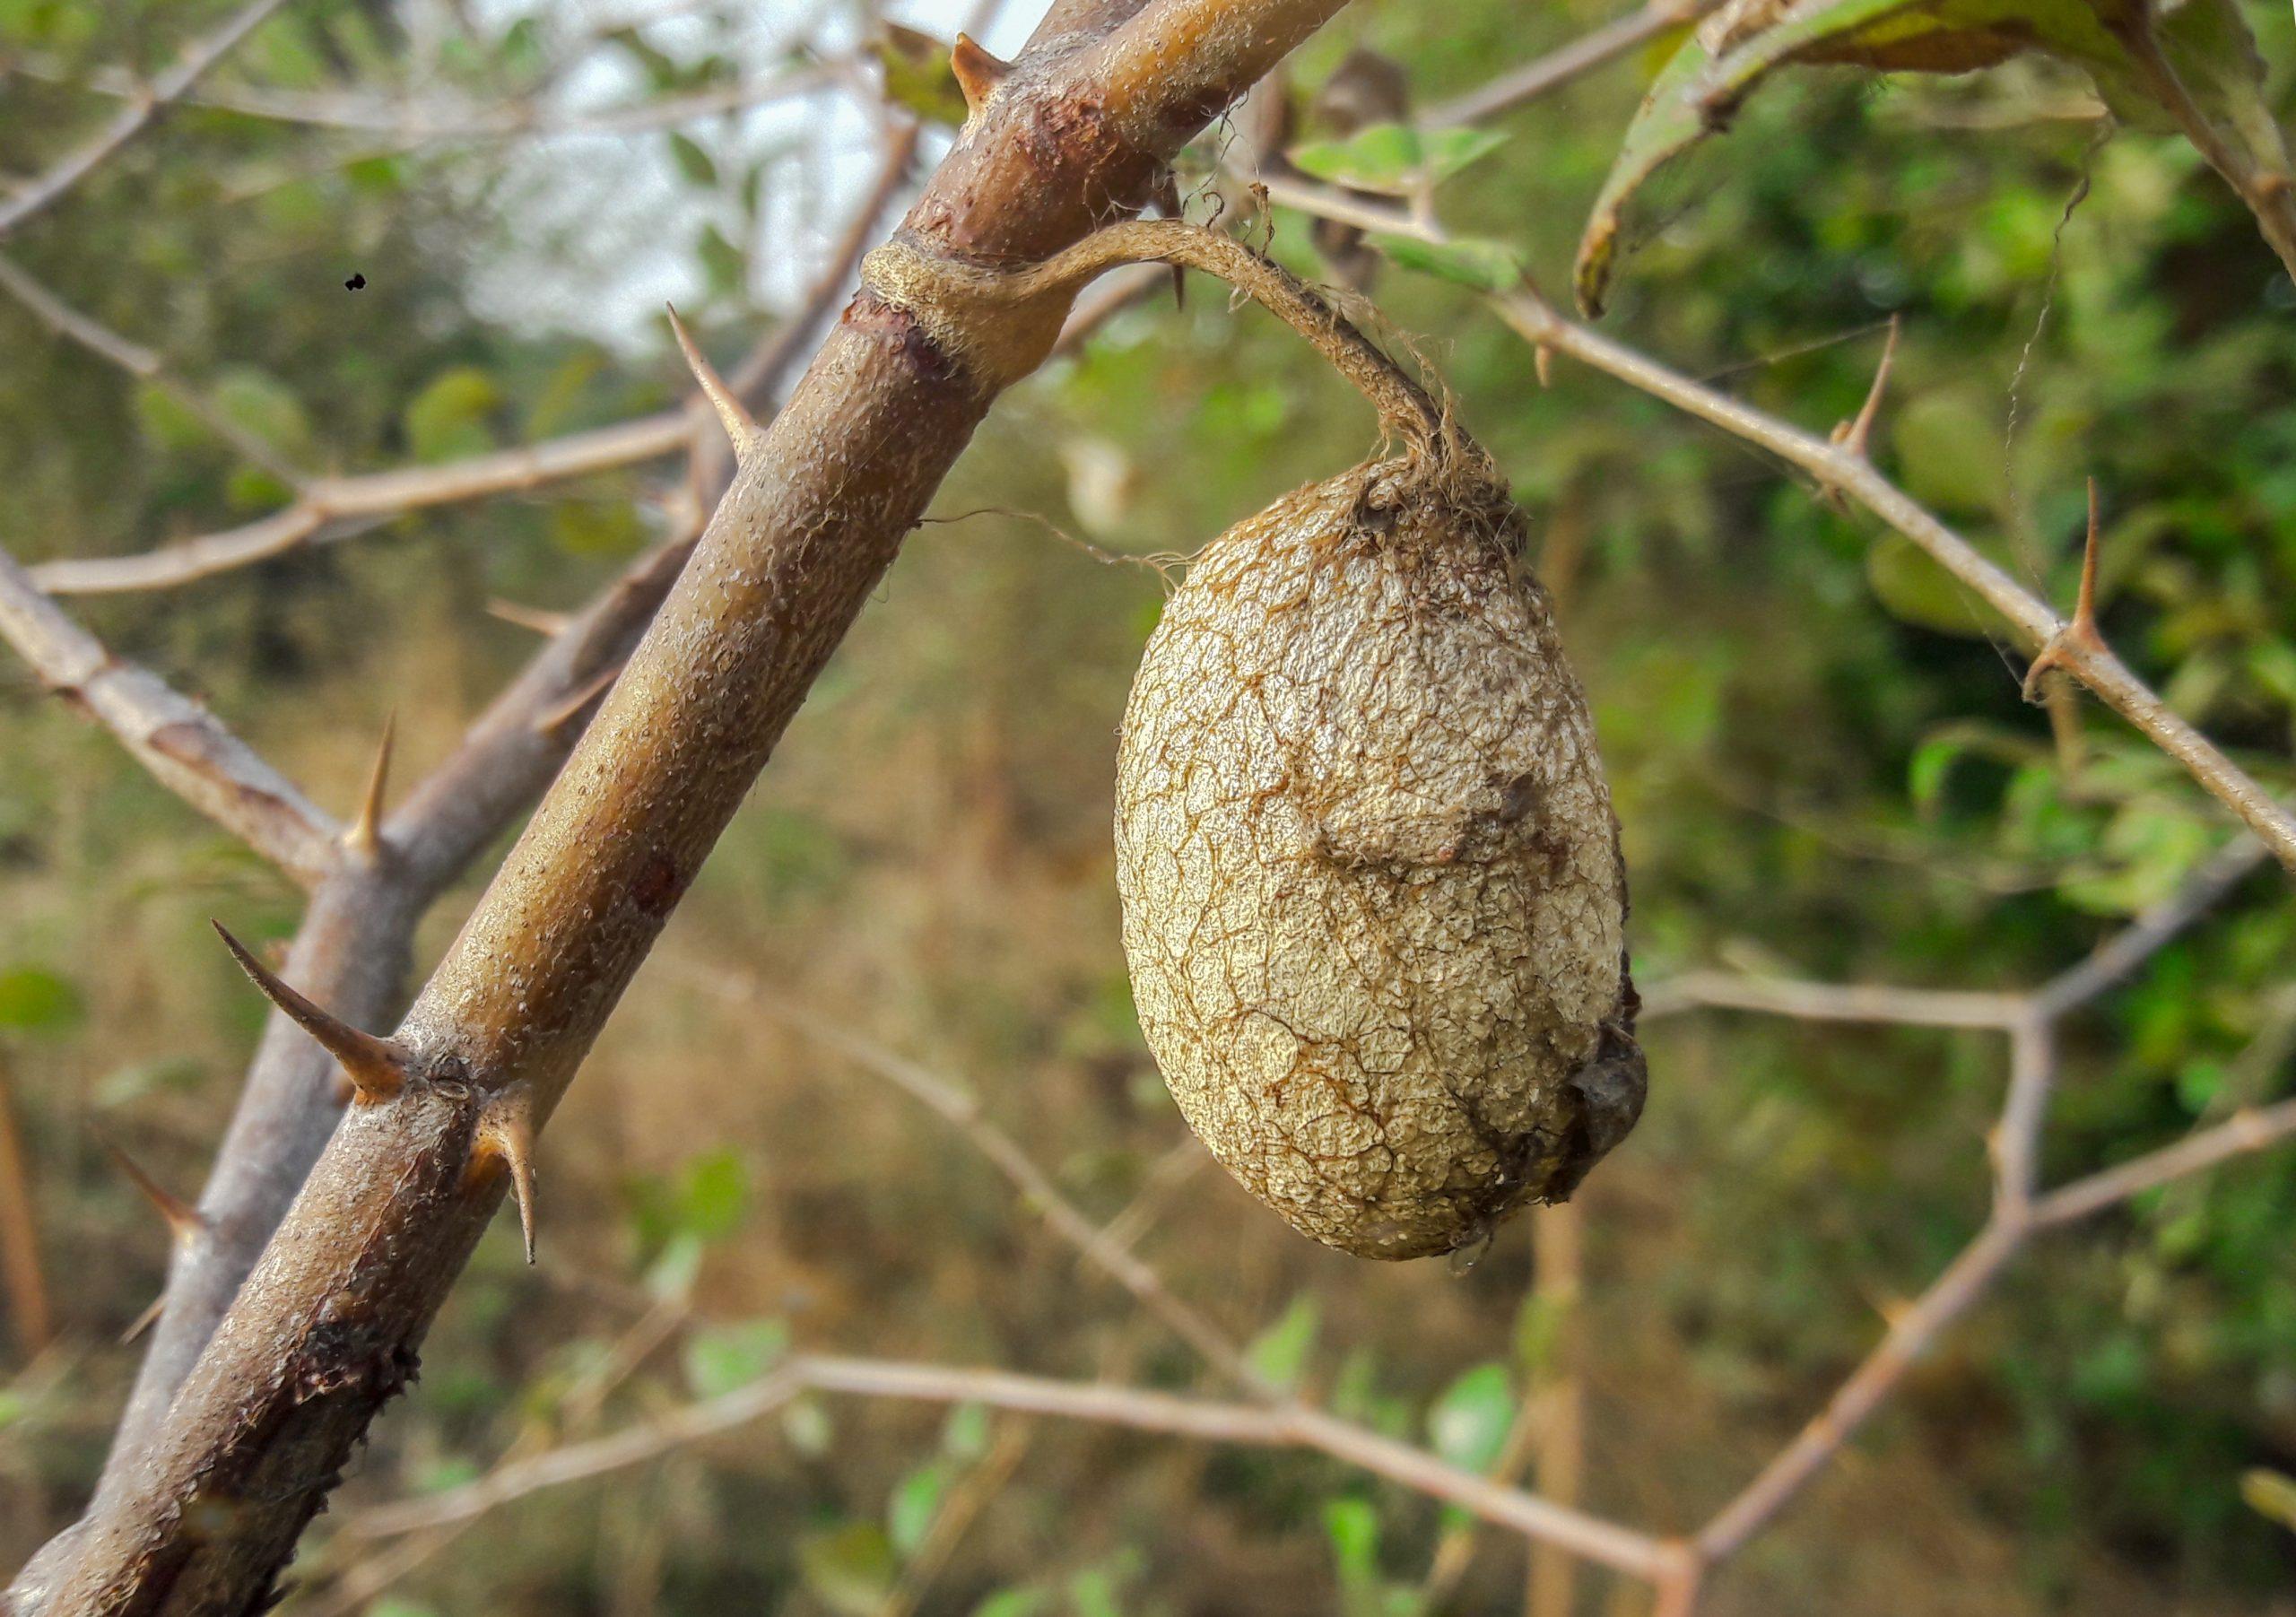 Silkworm cocoon on plant